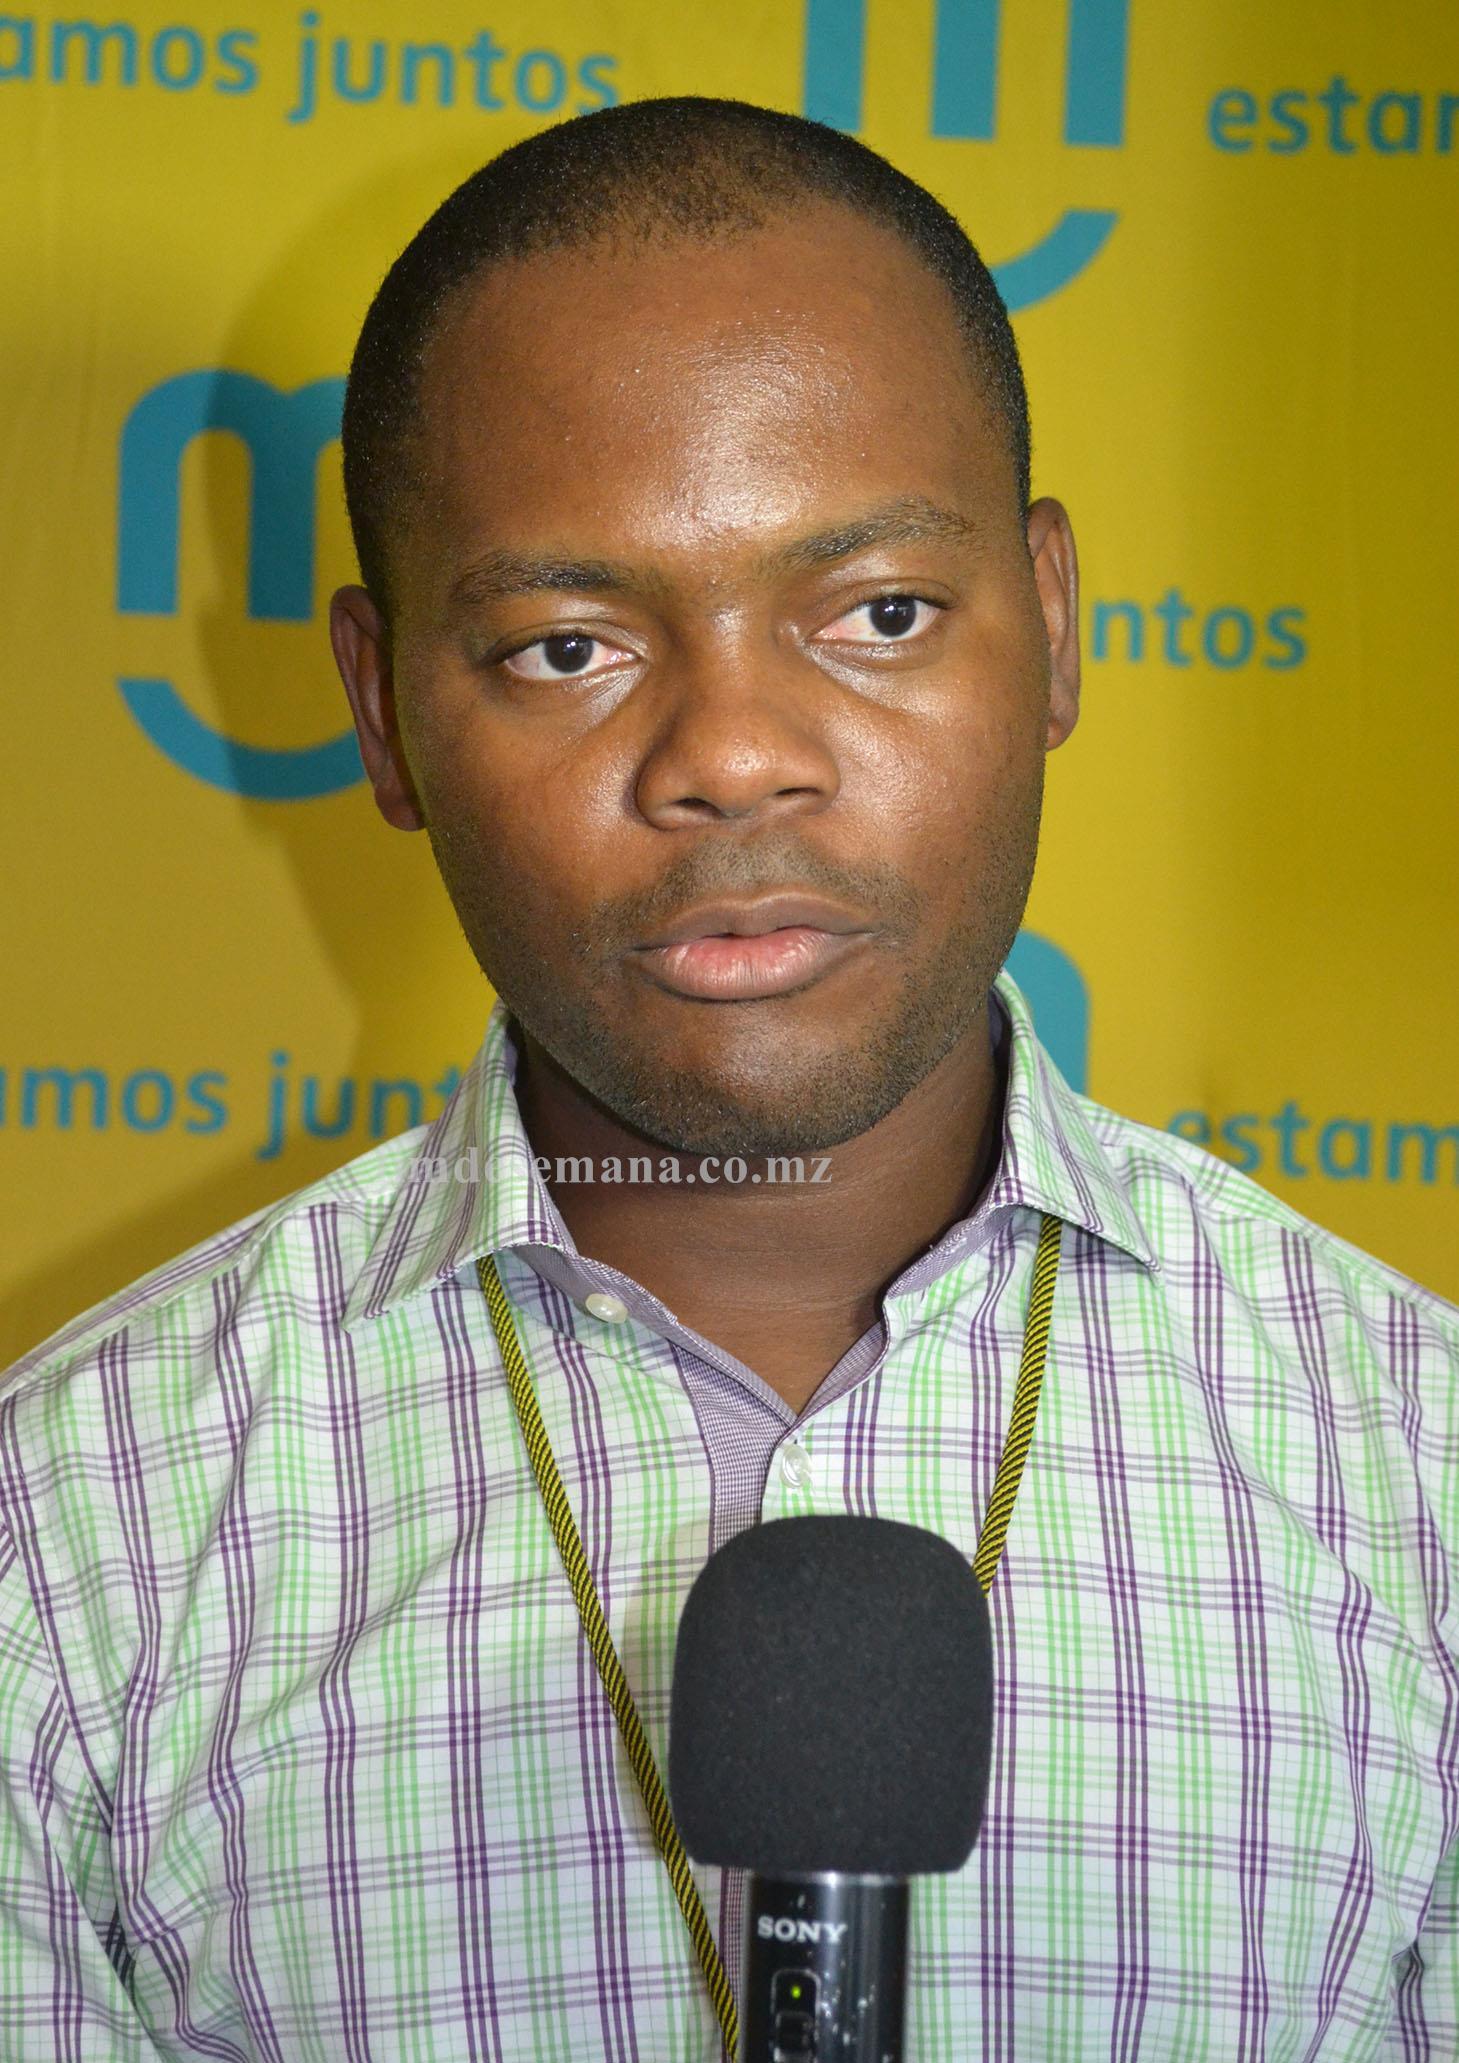 Jonas Alberto Representante da mcel